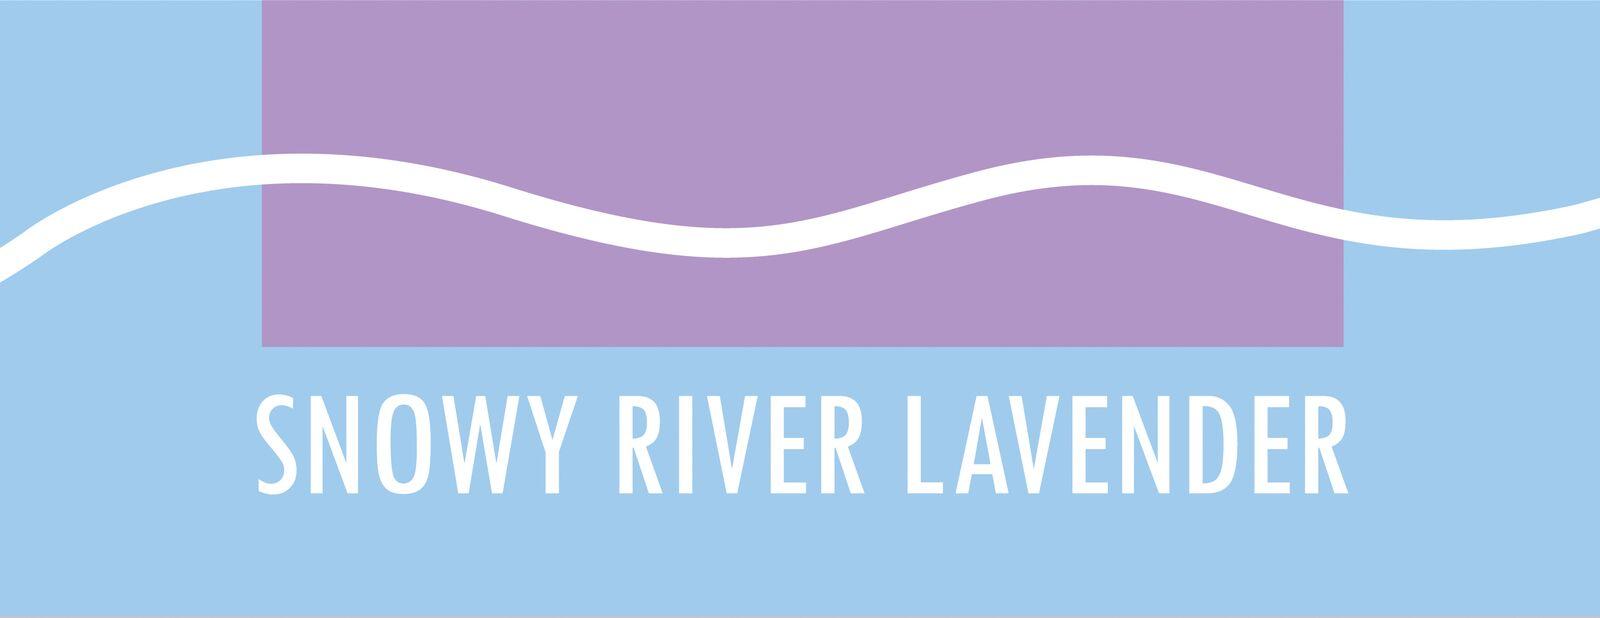 Snowy River Lavender